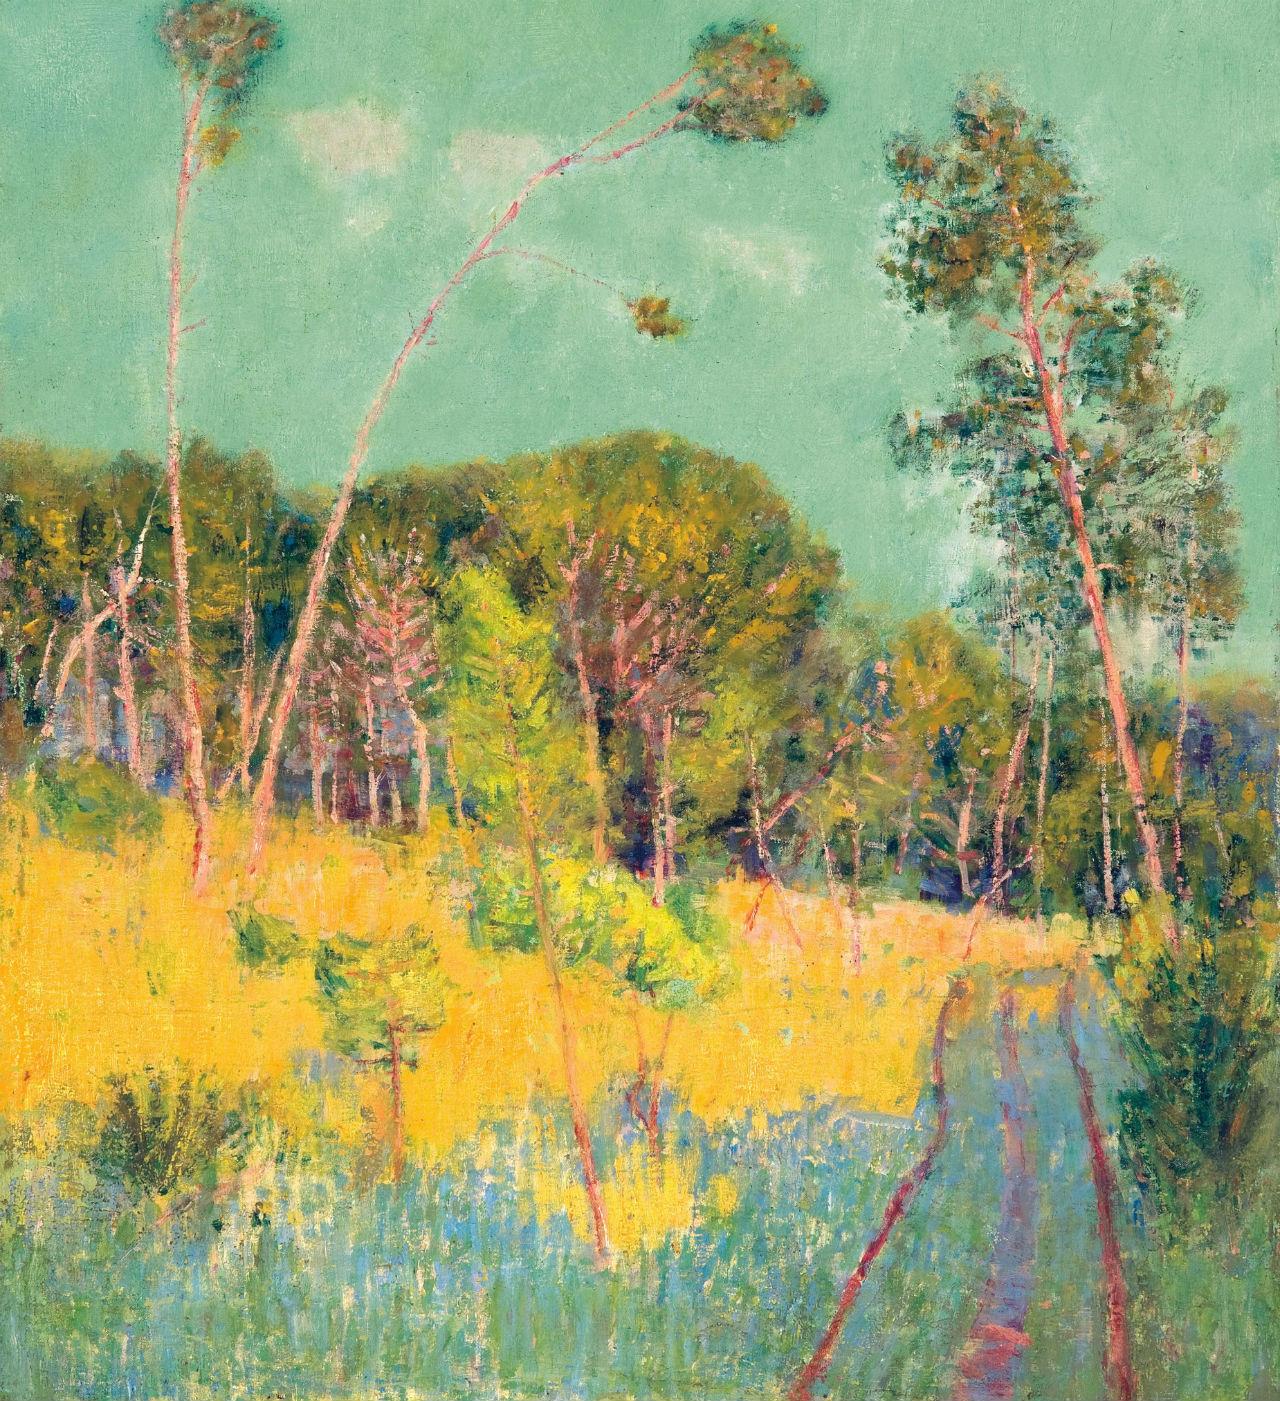 2-Живопись_Джон-Питер-Рассел_A-Clearing-in-the-Forest-1891.jpg